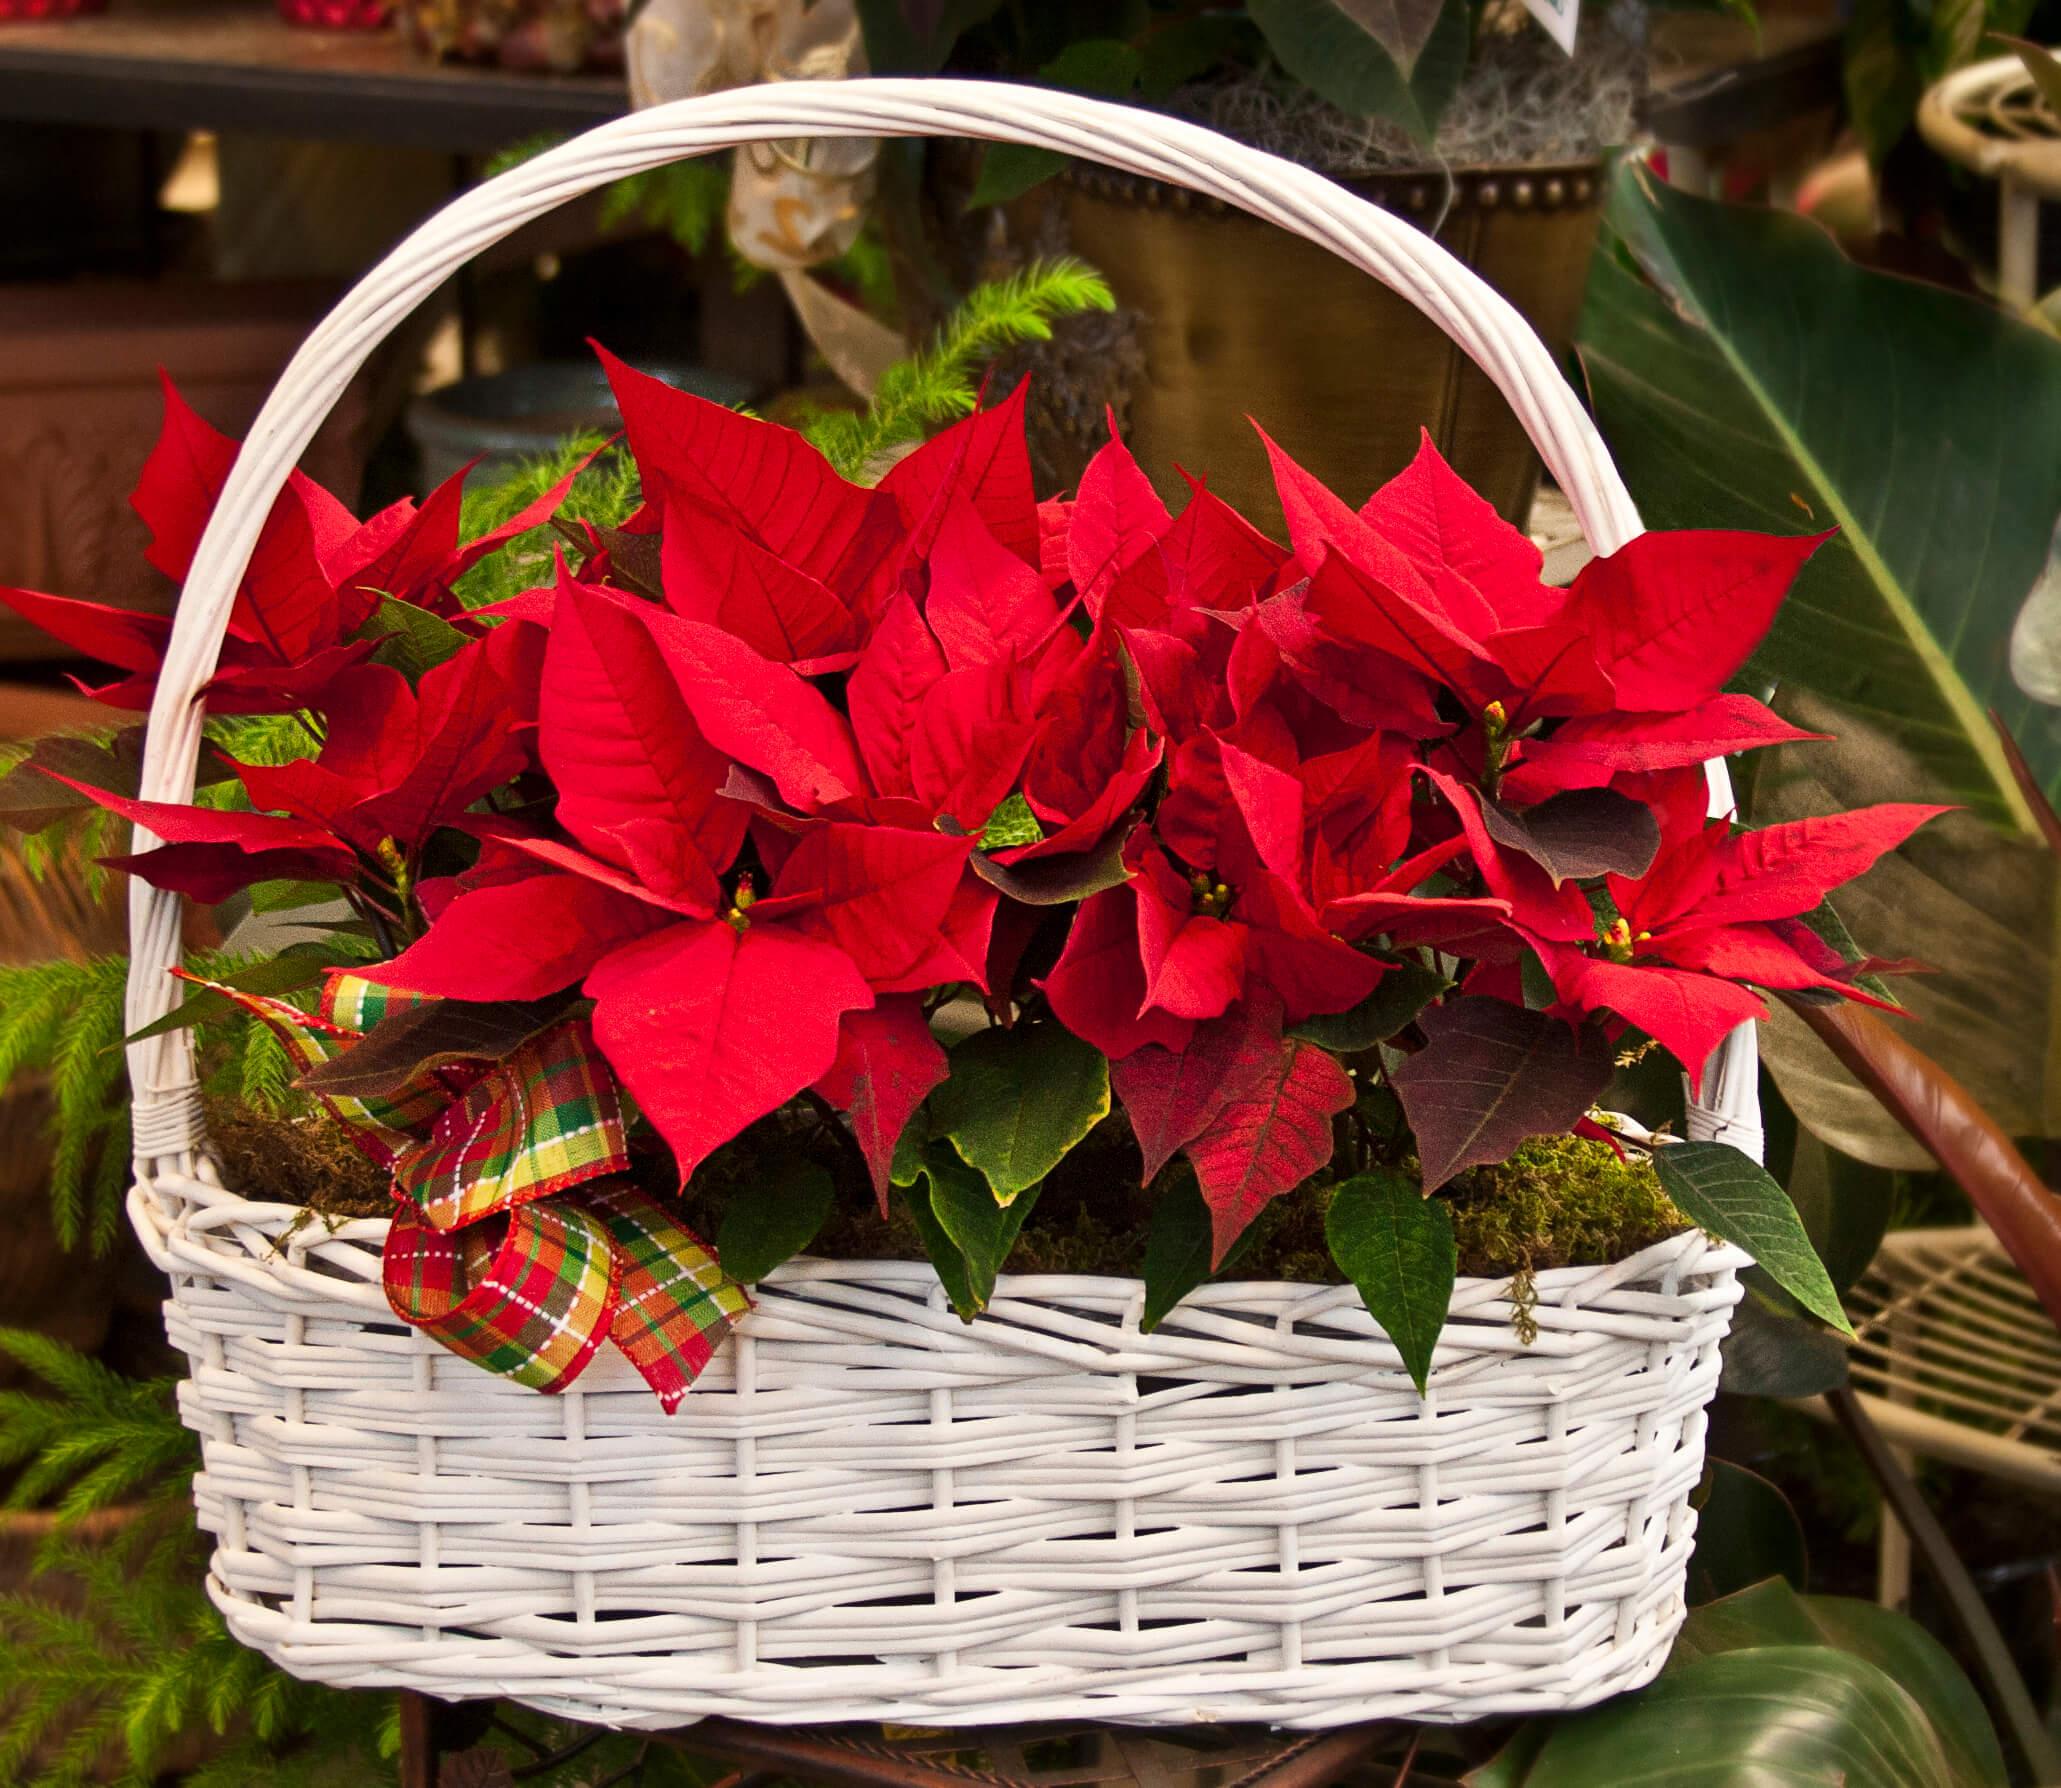 Vegan Holiday Gift Baskets: Win a Harry & David Gift Card